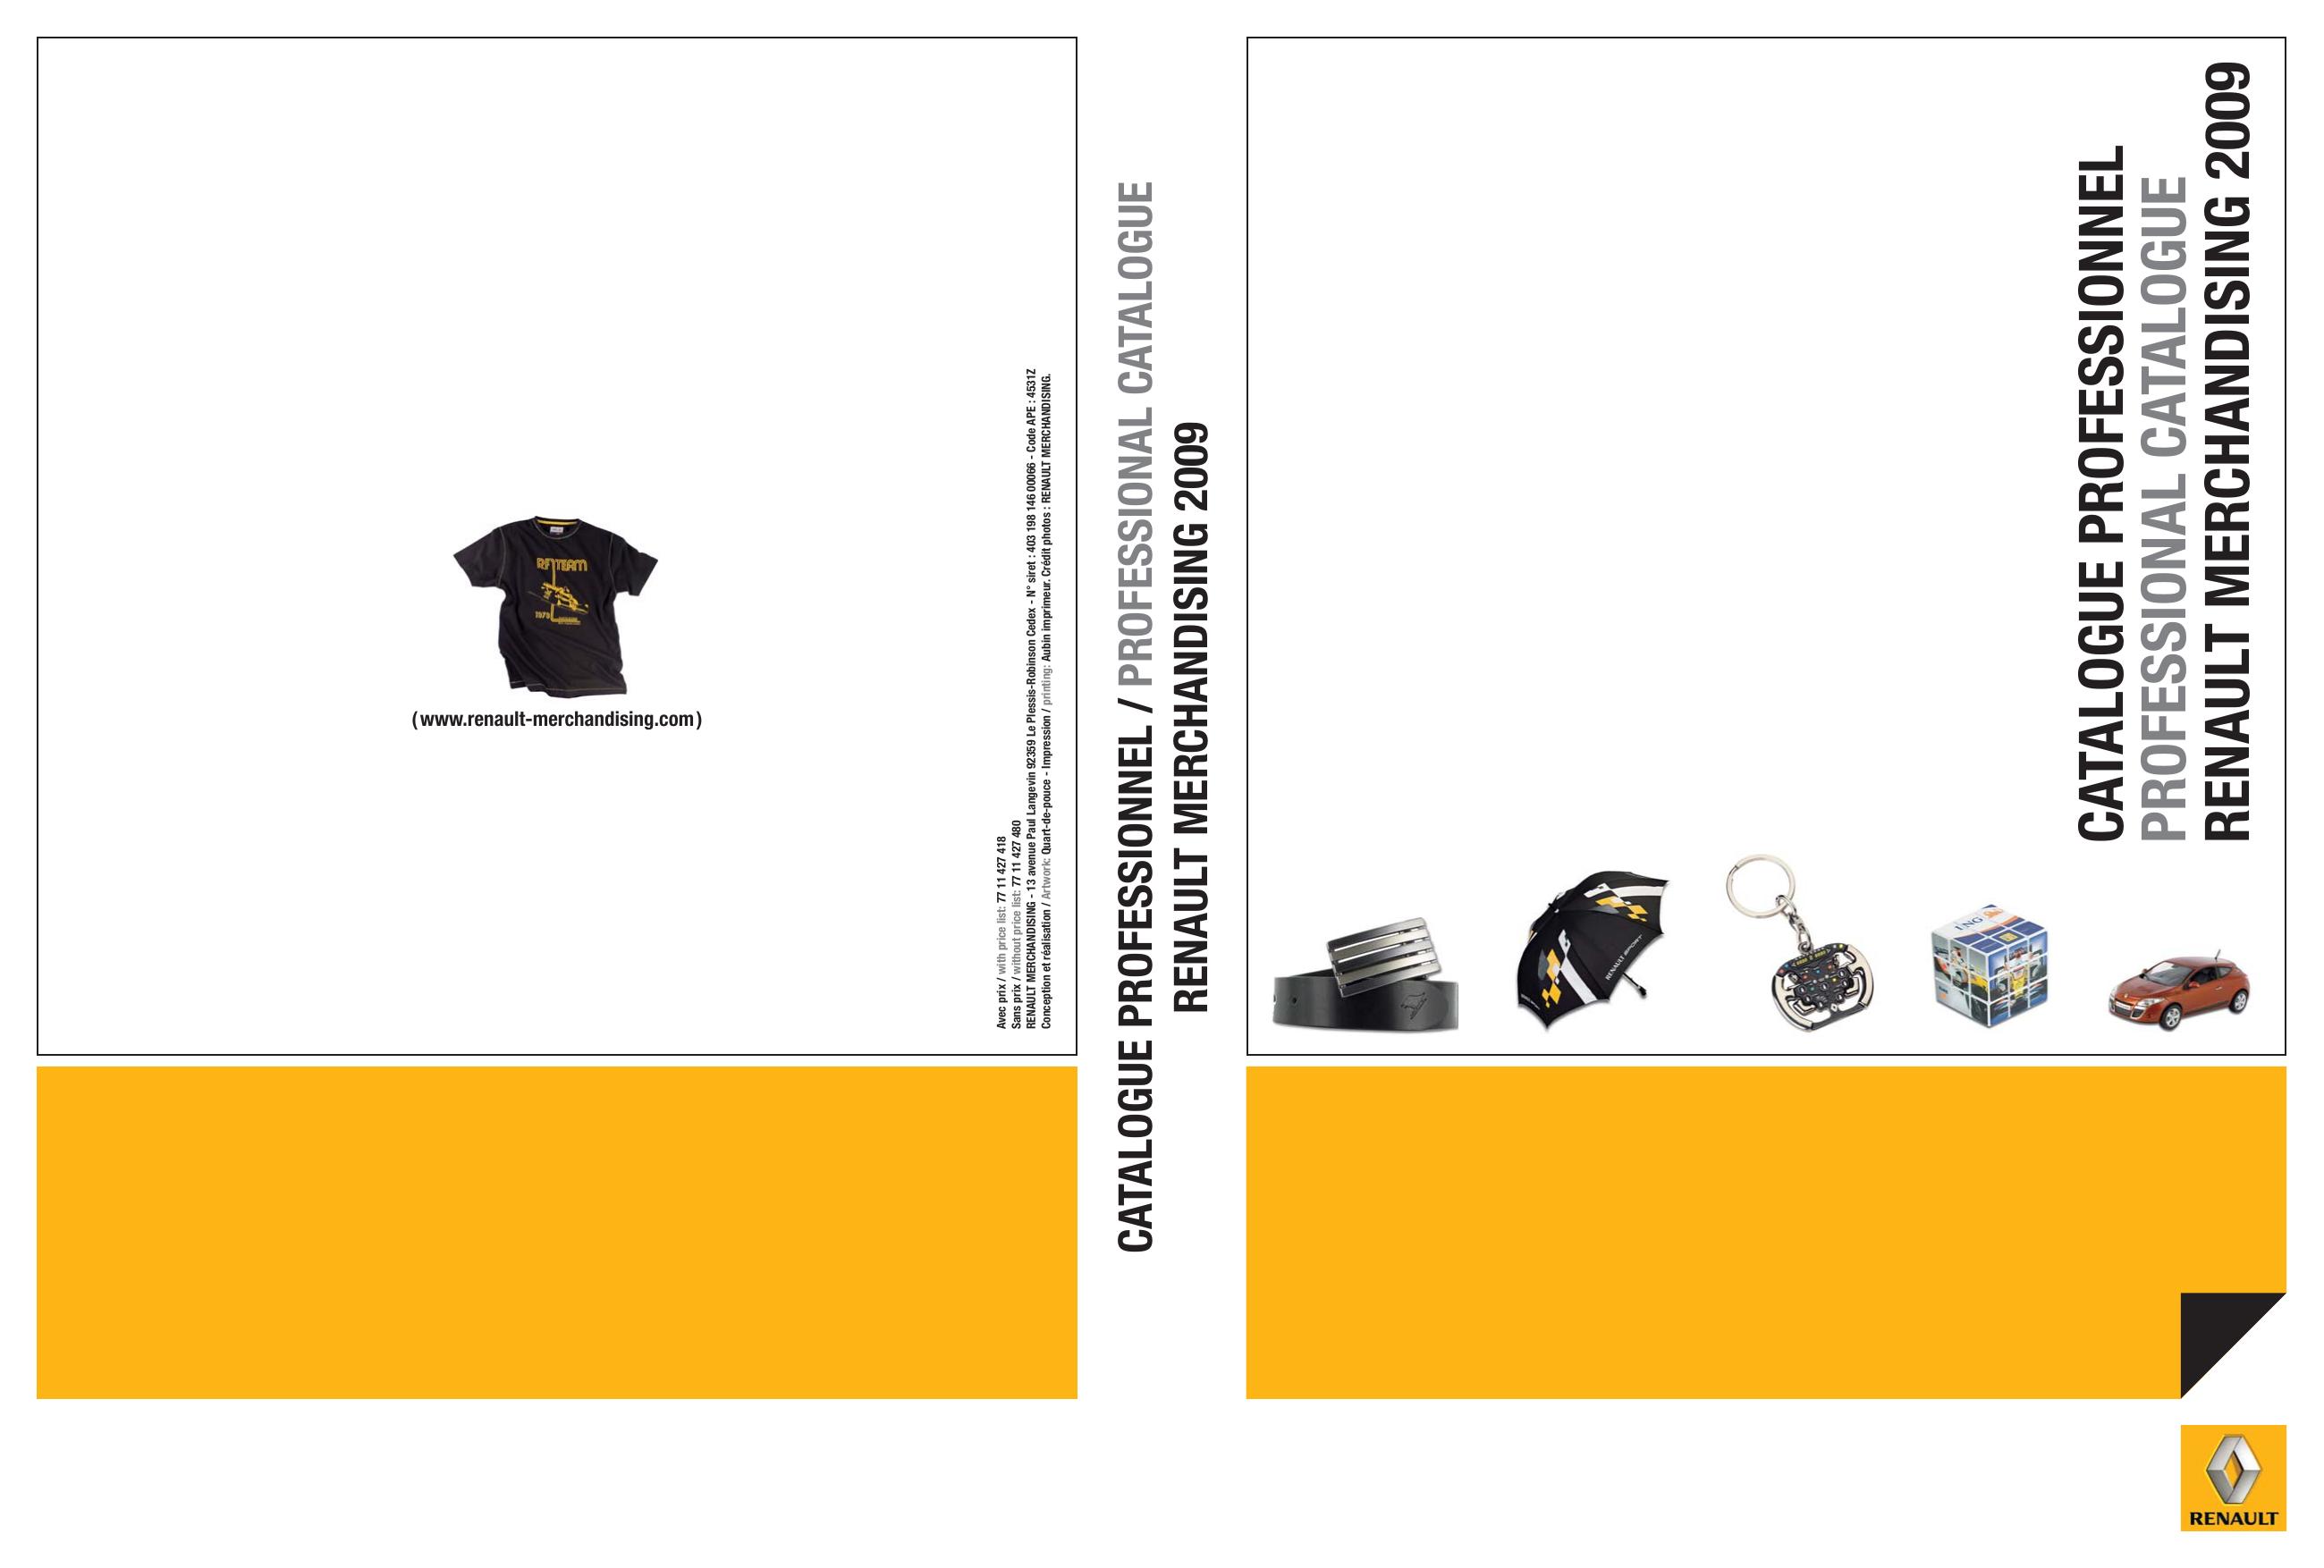 02 textile - Bras Concesionar Renault   manualzz.com d94b2f79b049